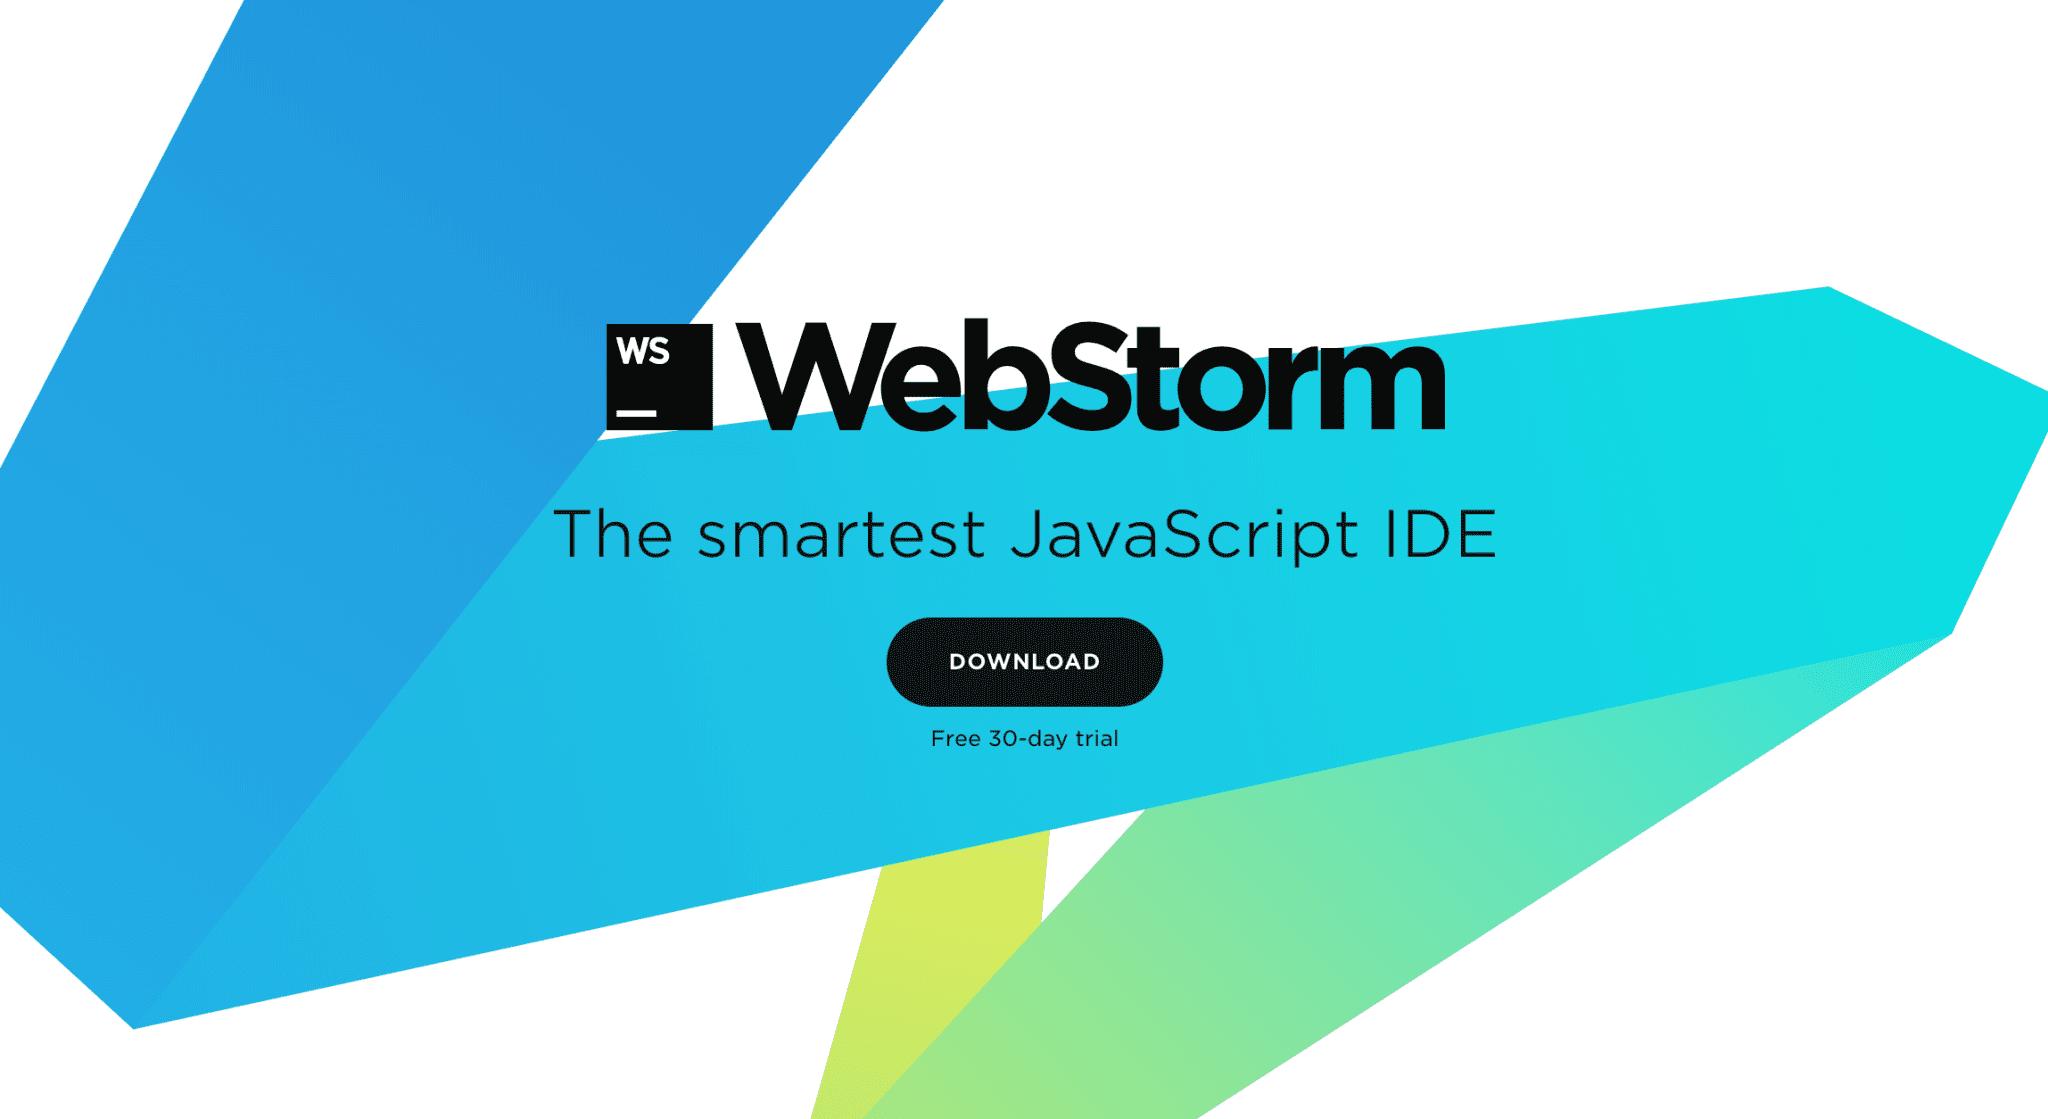 Jet Brains' Webstorm JavaScript IDE.